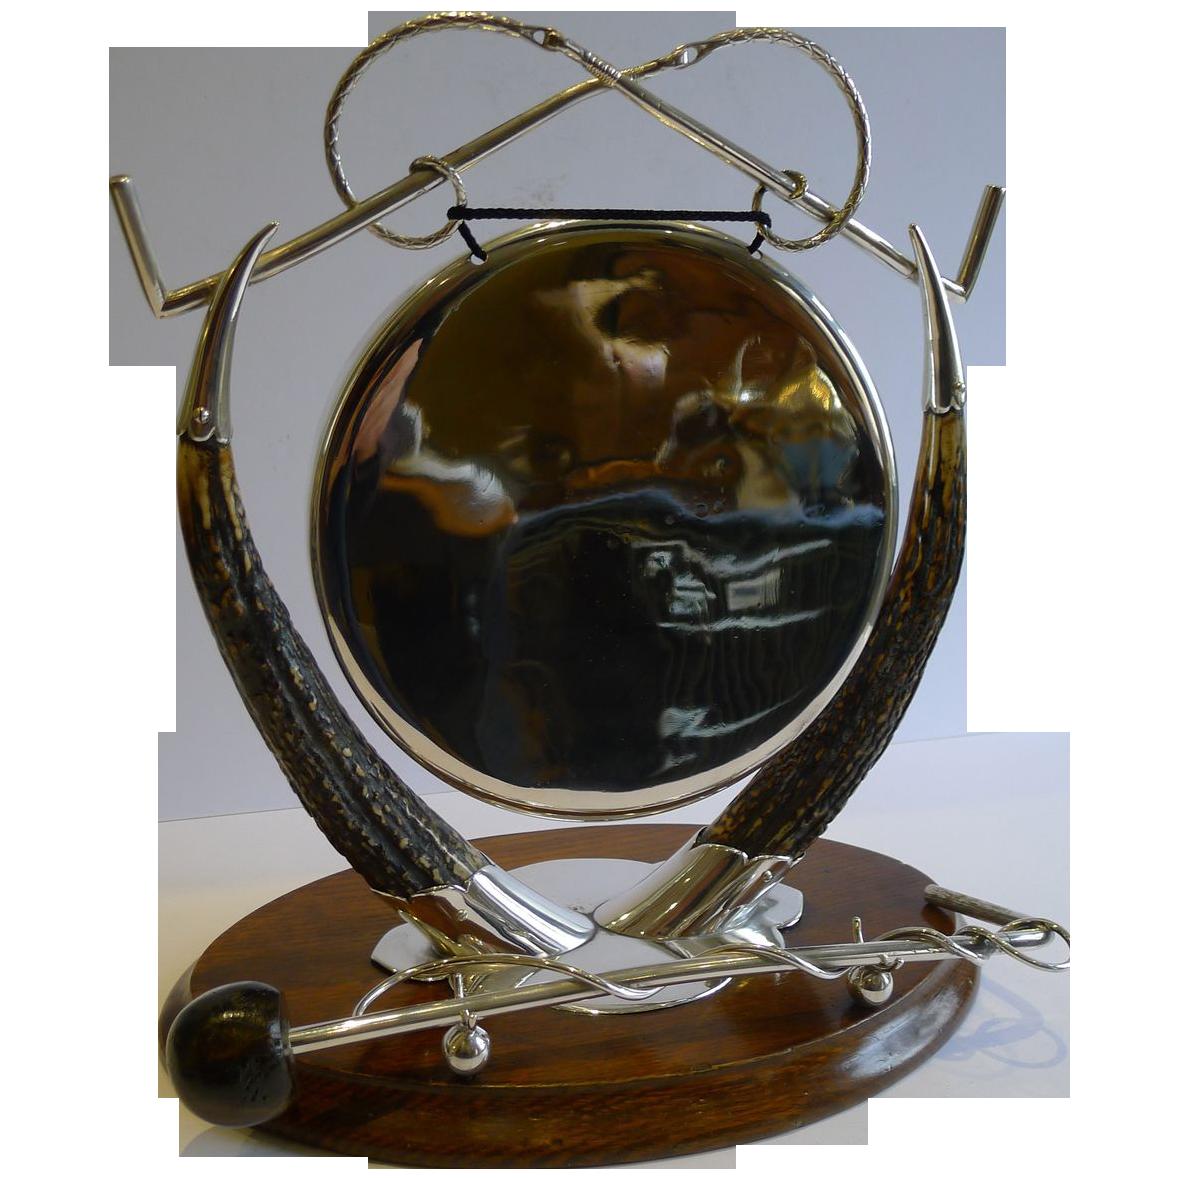 Antique English Equestrian Oak & Silverplate Dinner Gong c.1890/1900